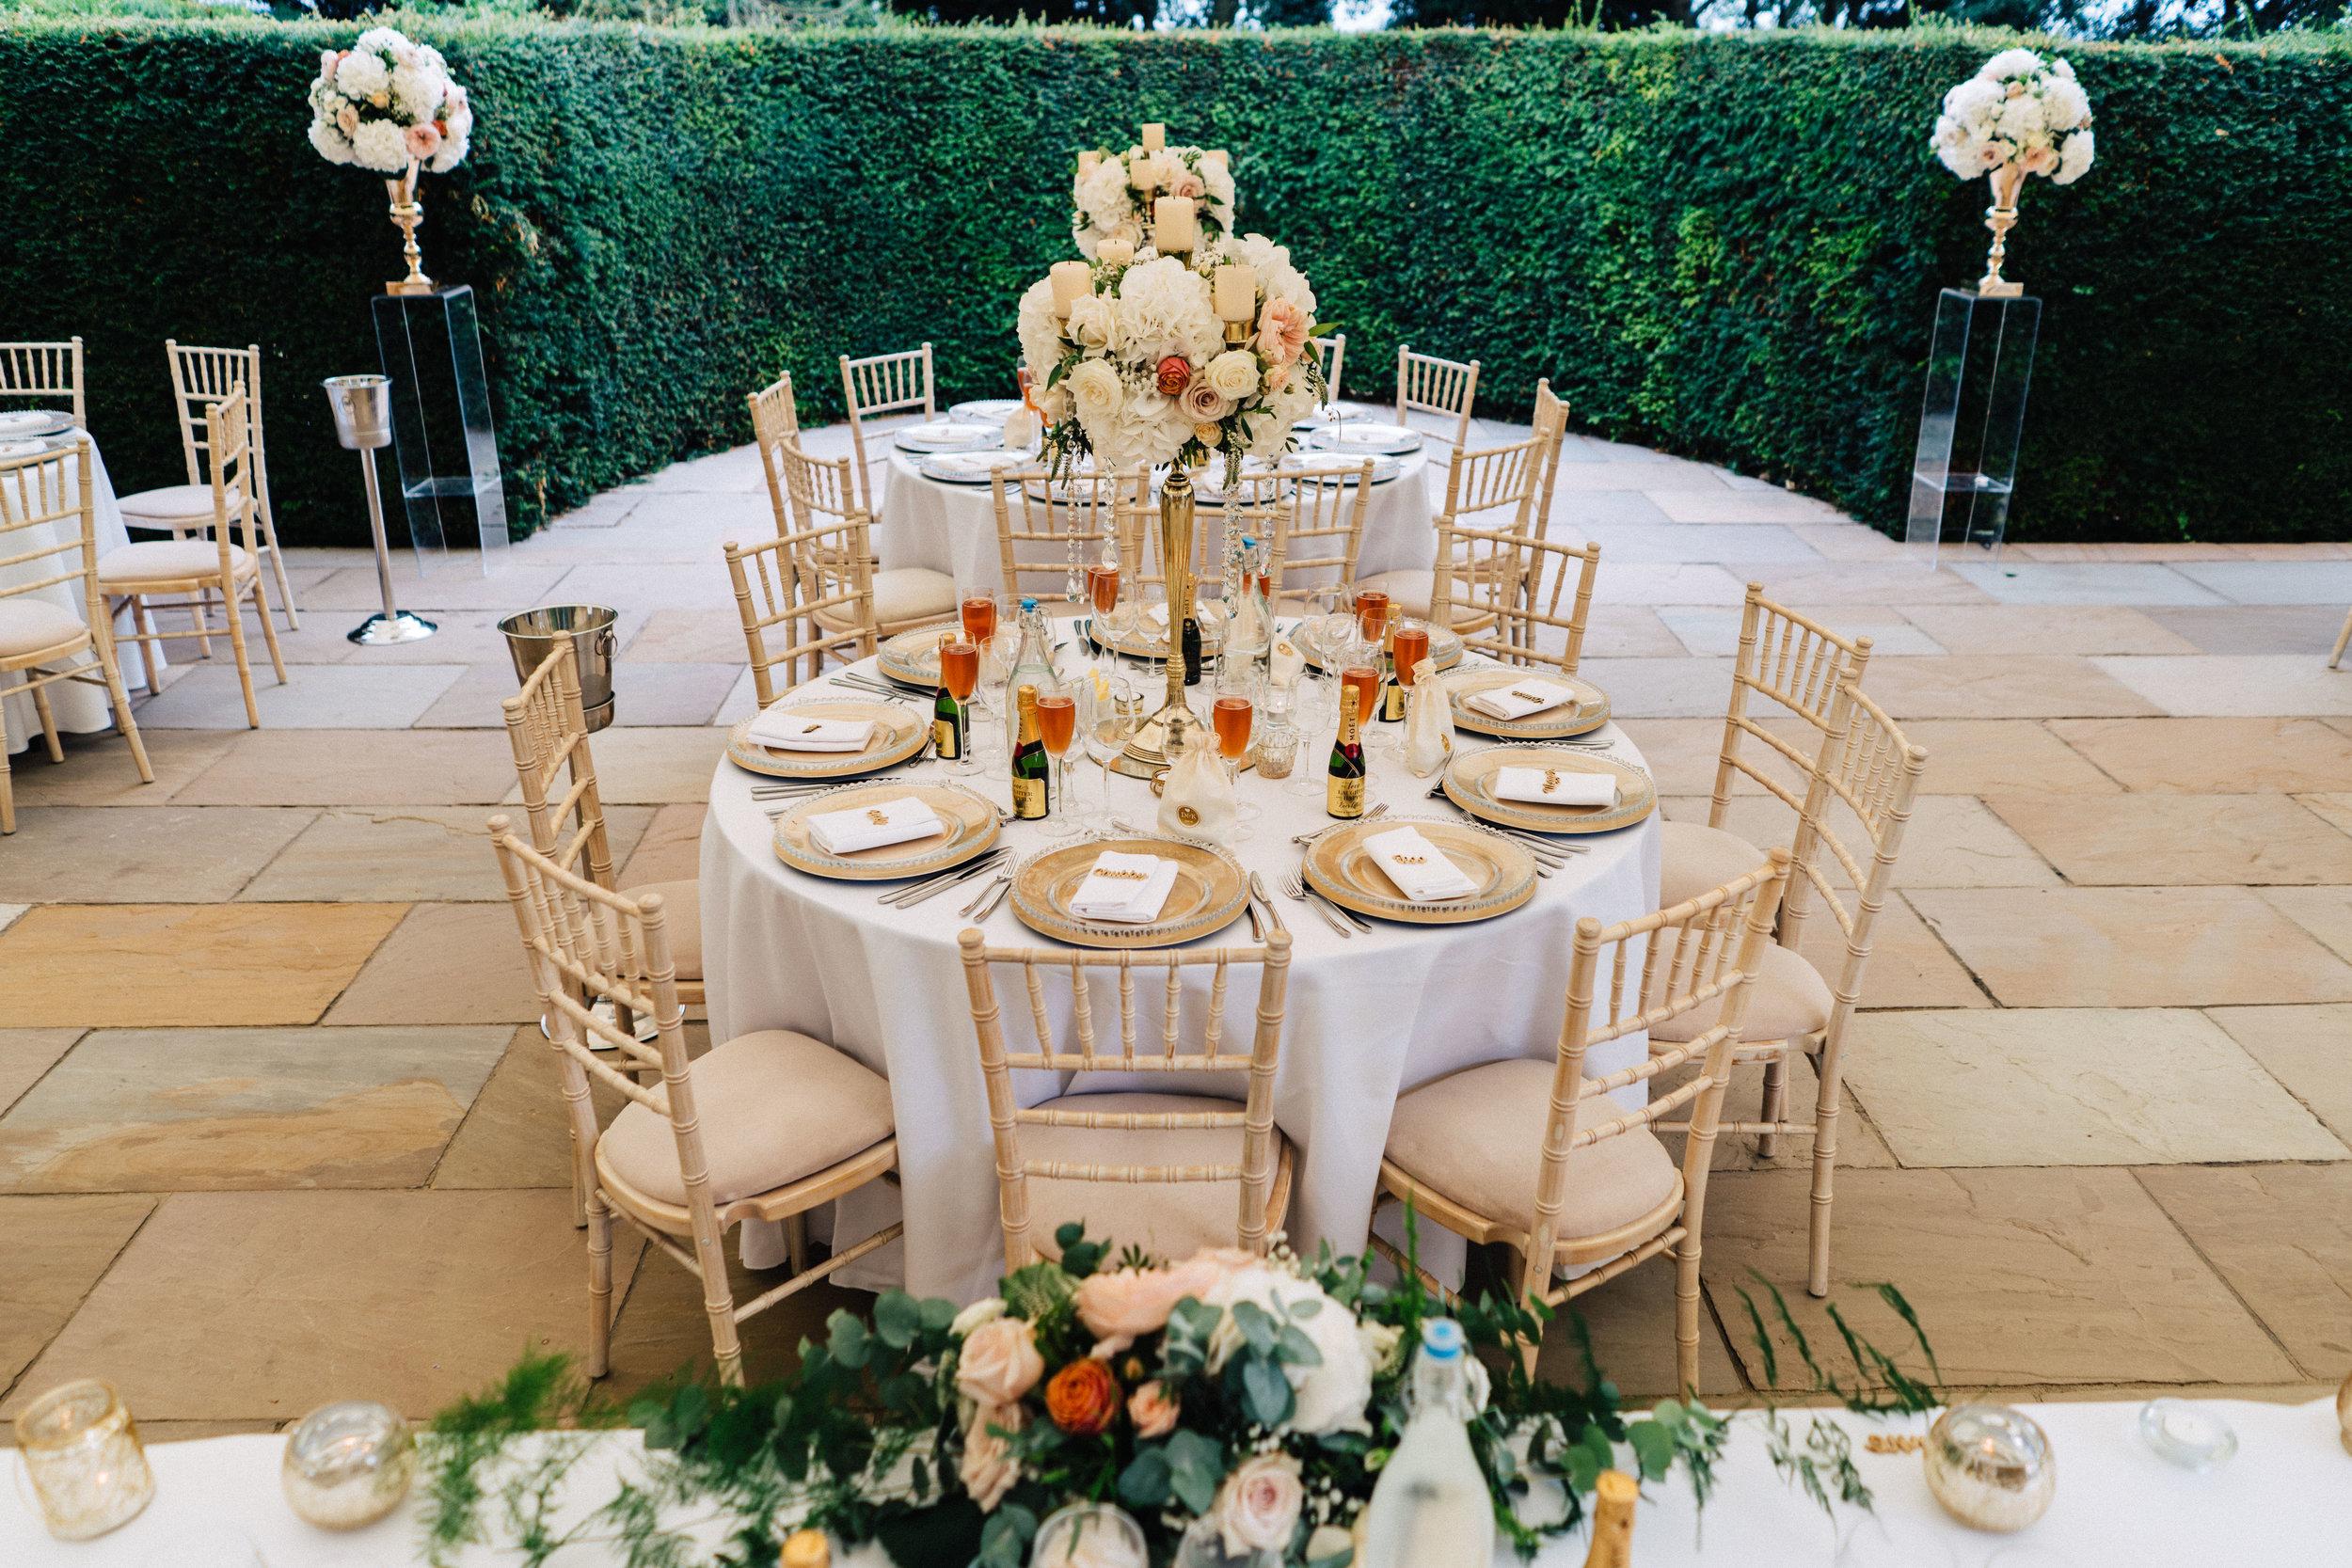 Cluskey-Smith Wedding Photography